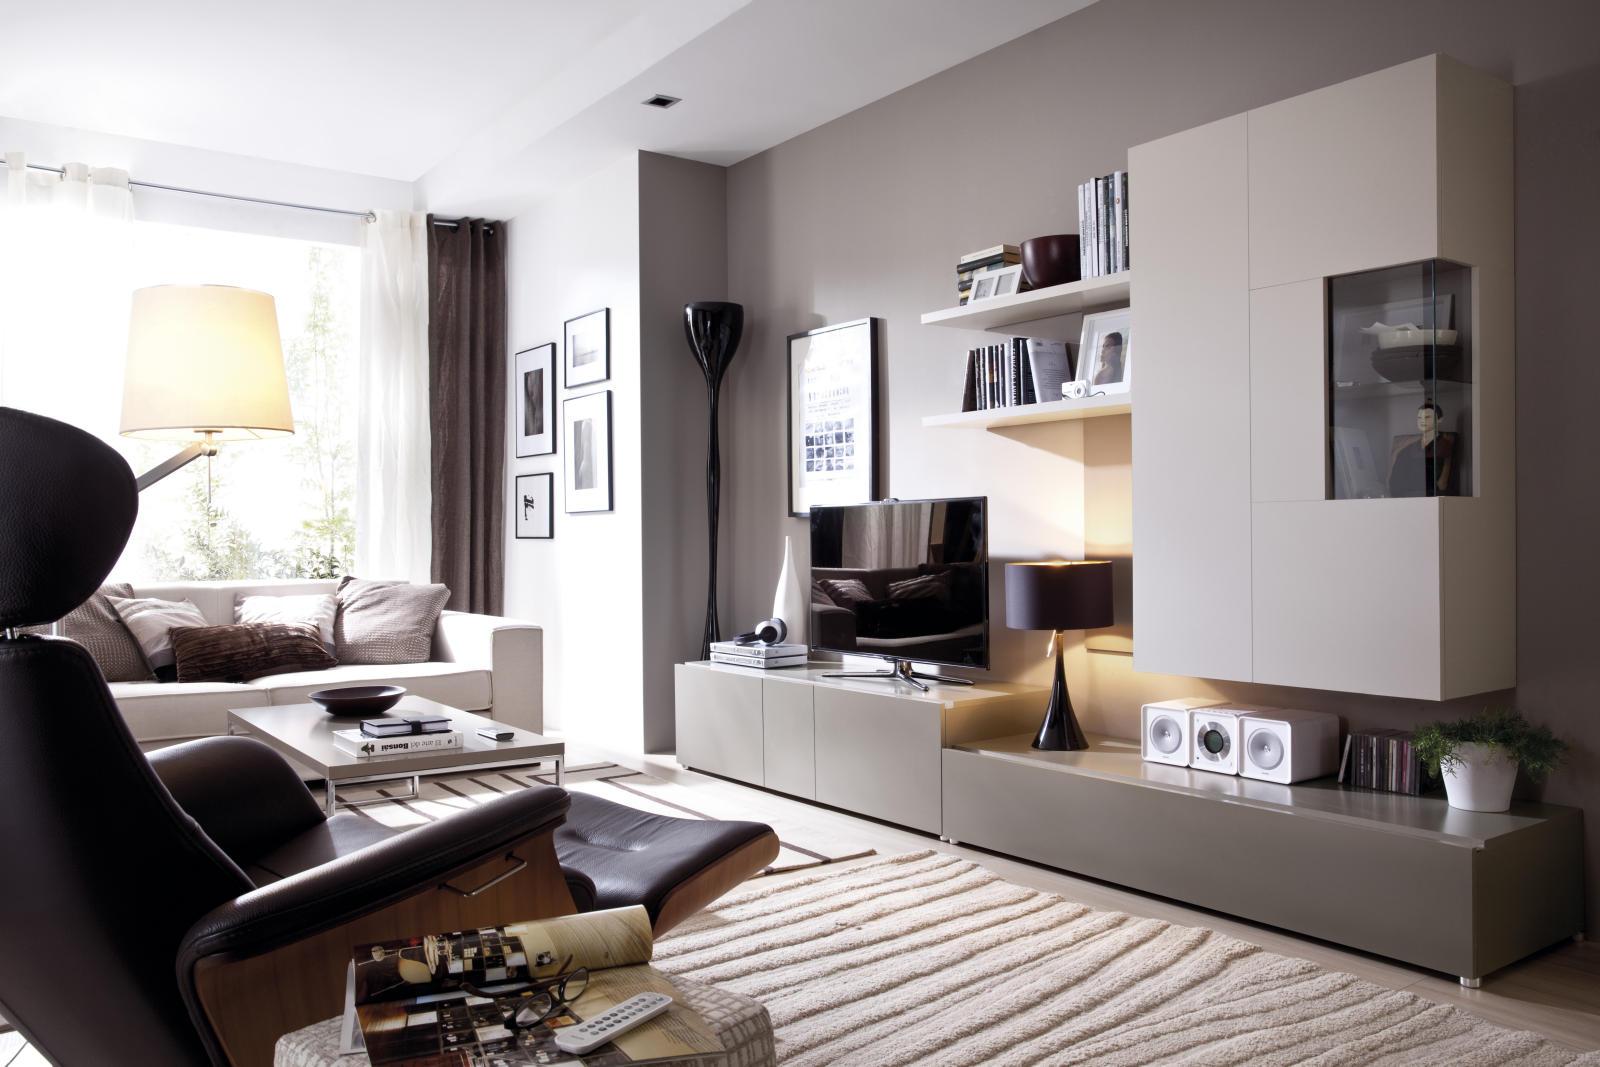 Sillas de dise o muebles epa blog - Muebles de salon de ikea ...